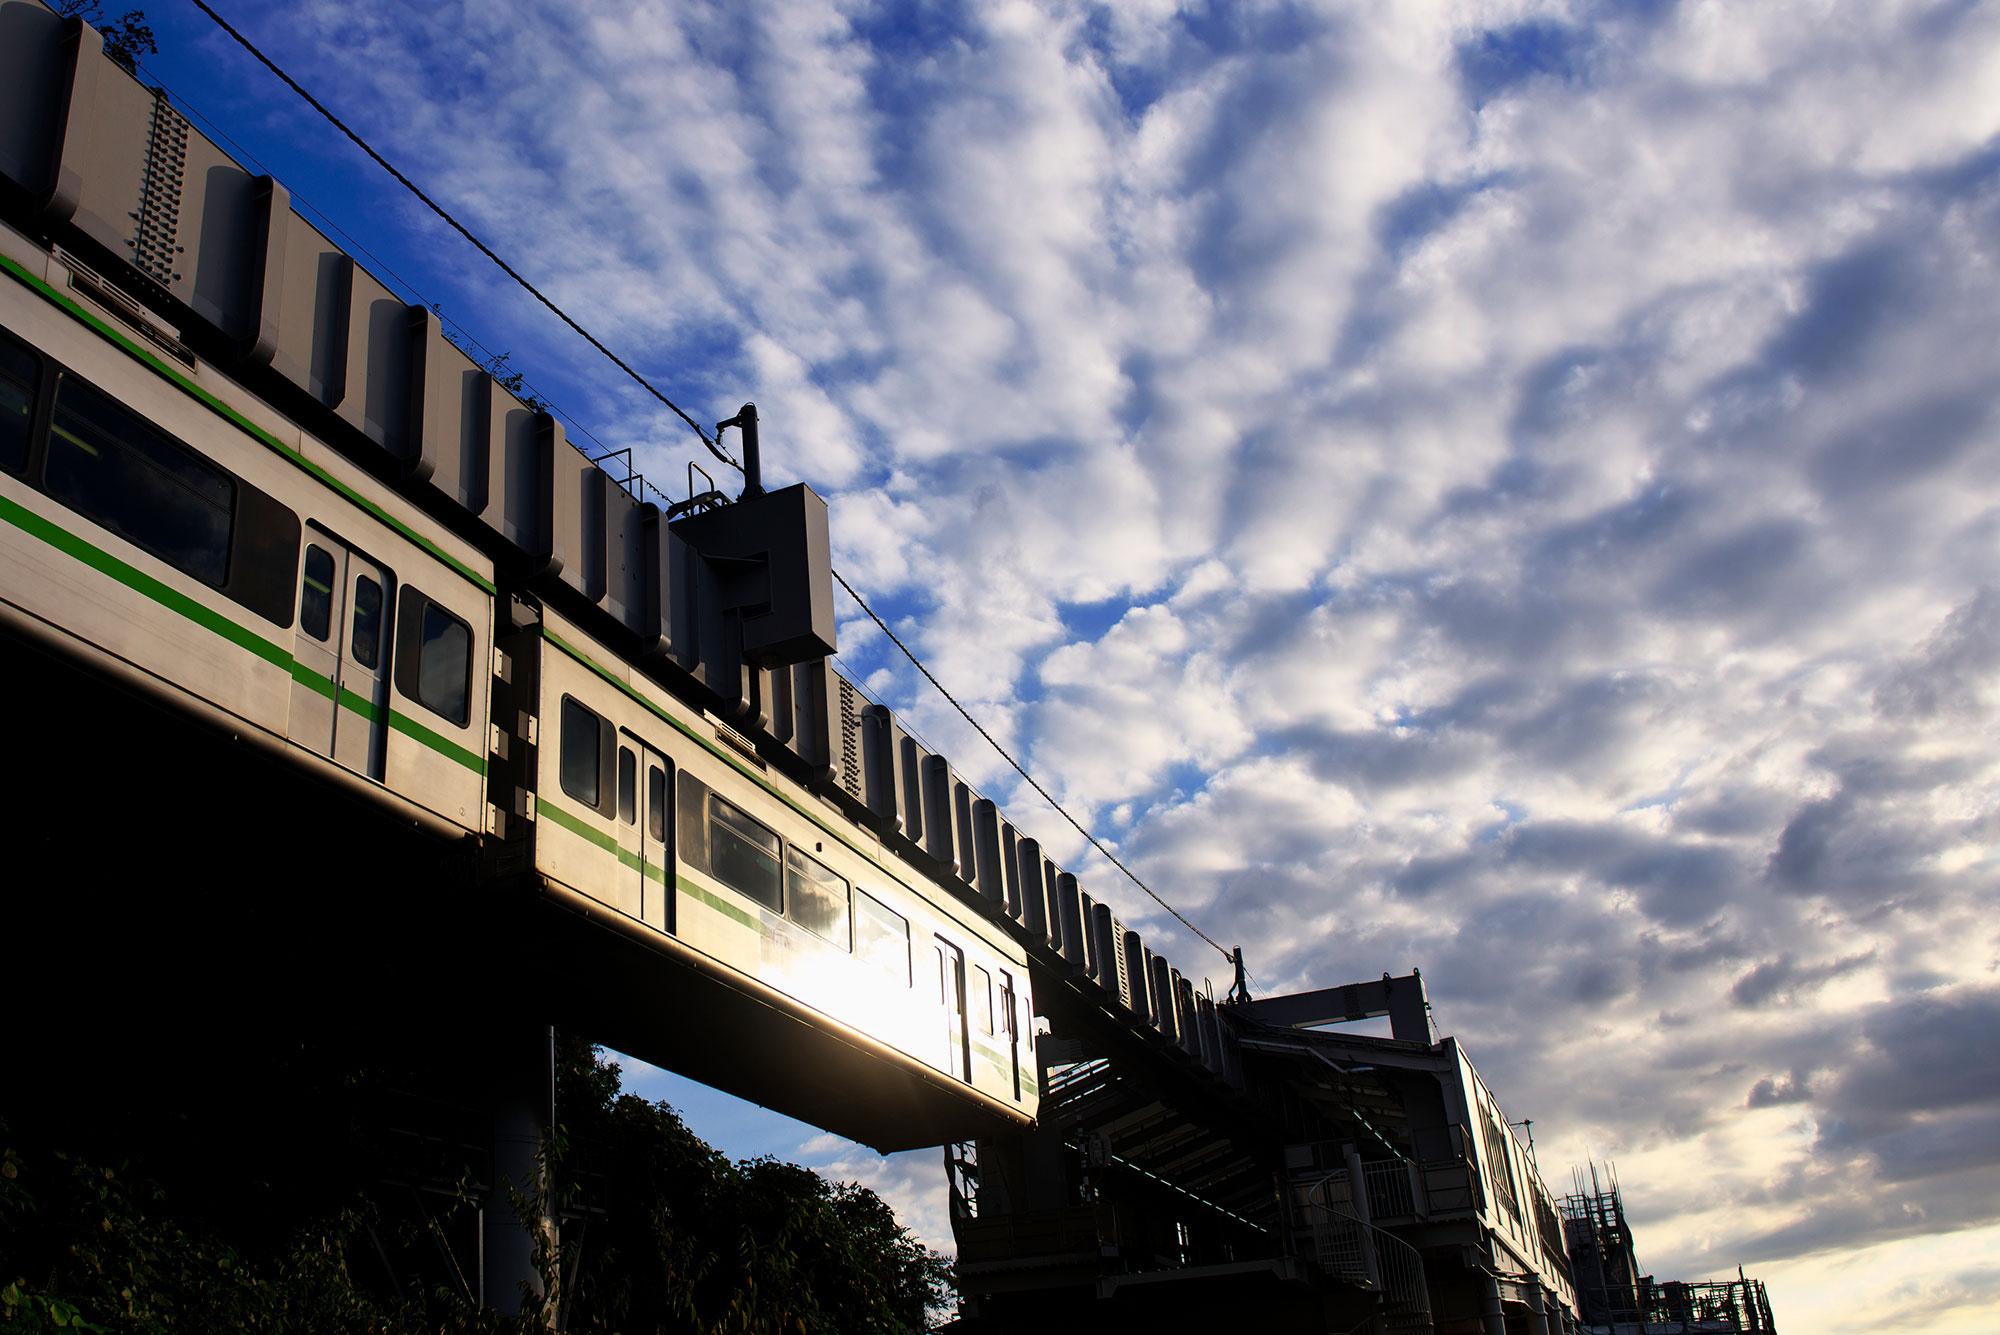 【mission 8】-湘南江の島編- 終点は旅の始発駅